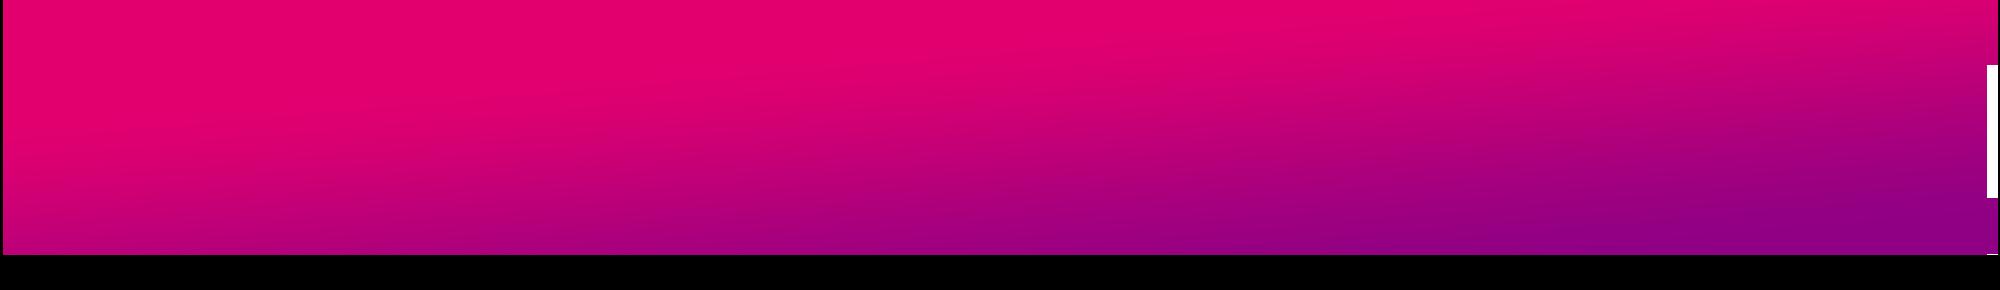 Severe Sex Logo Image